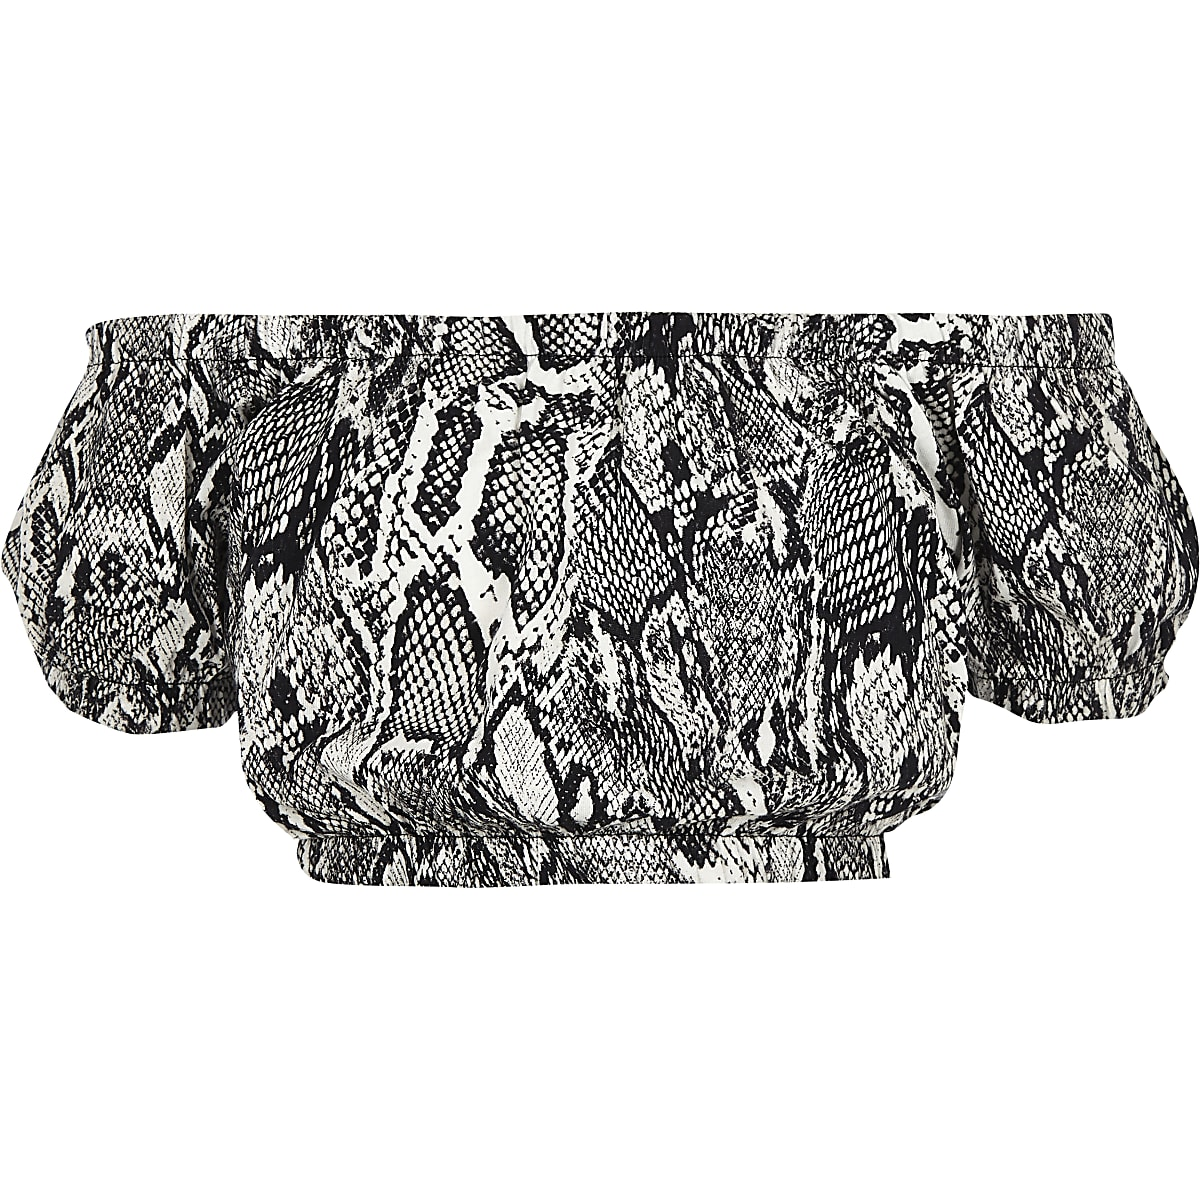 234cb10b05f61 Girls grey snake print bardot top - Bardot   Cold Shoulder - Tops - girls